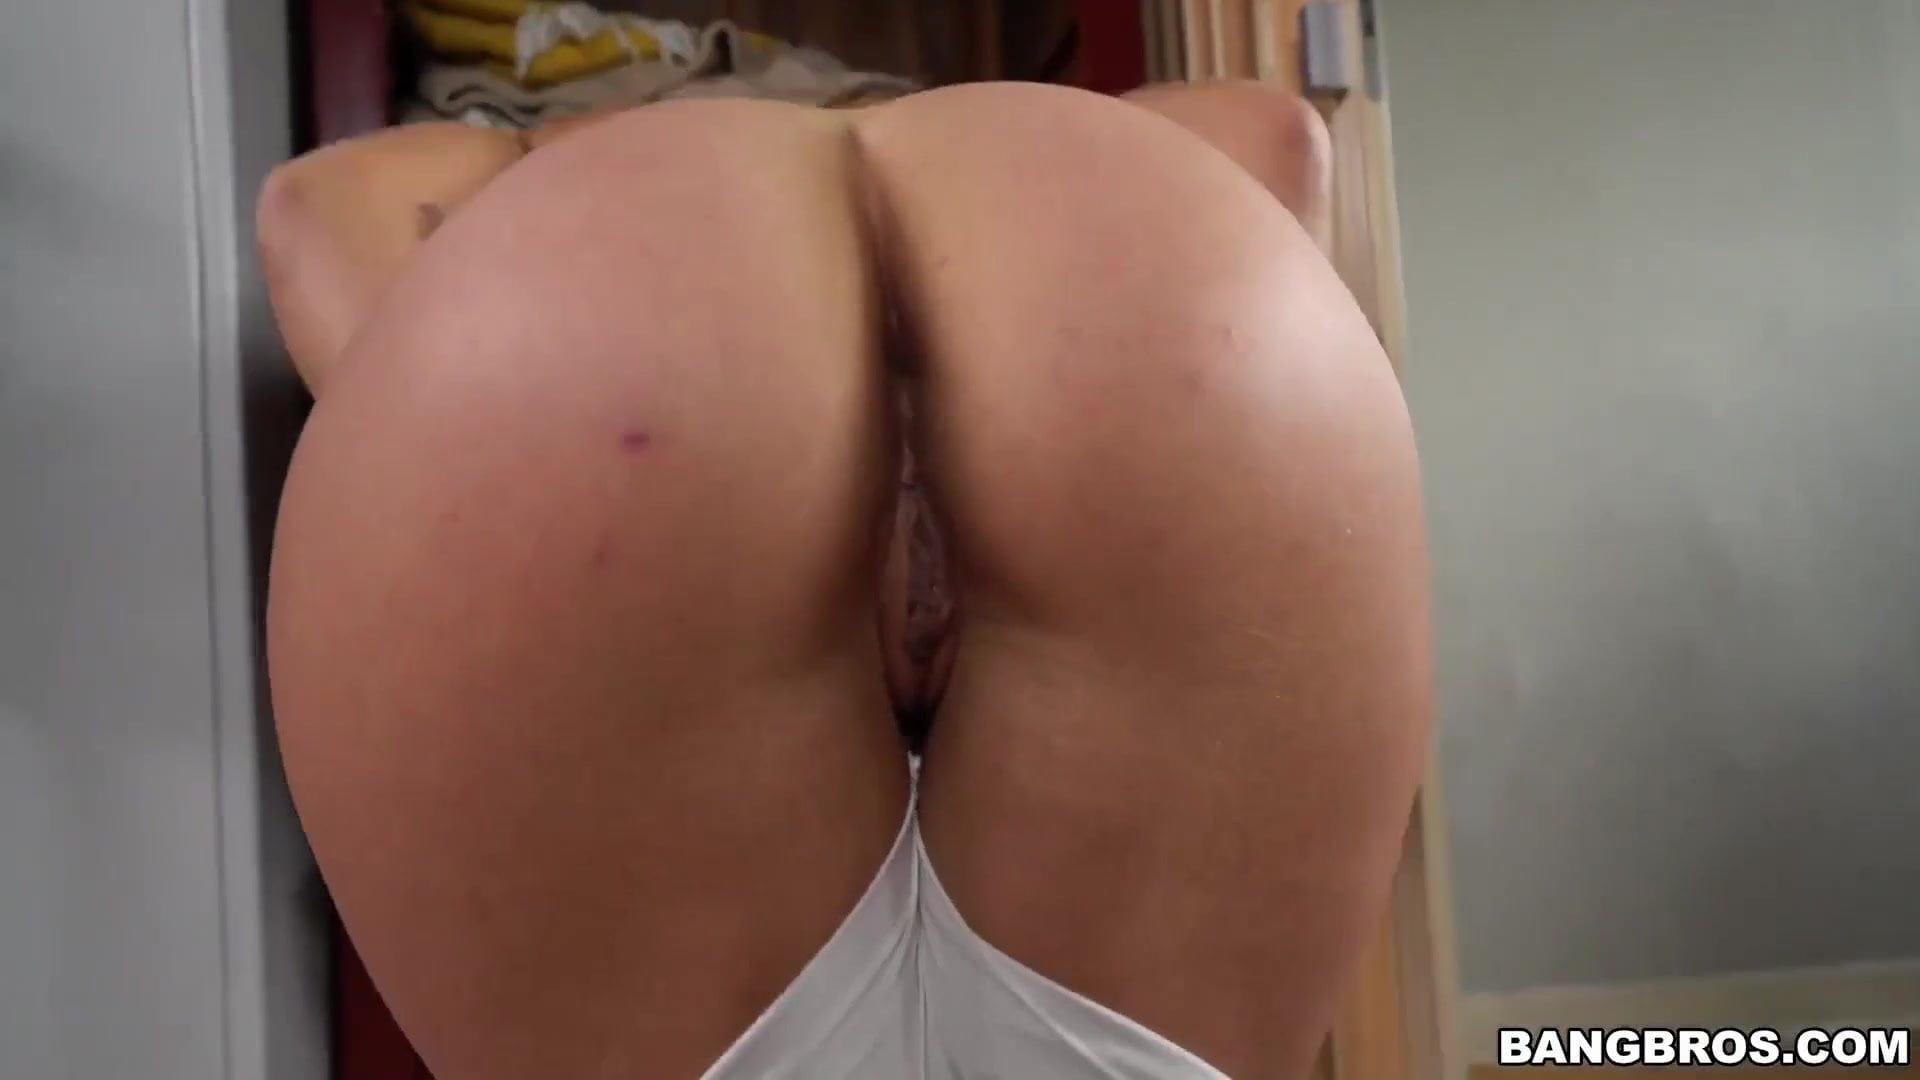 Big Ass Milf Anal Threesome